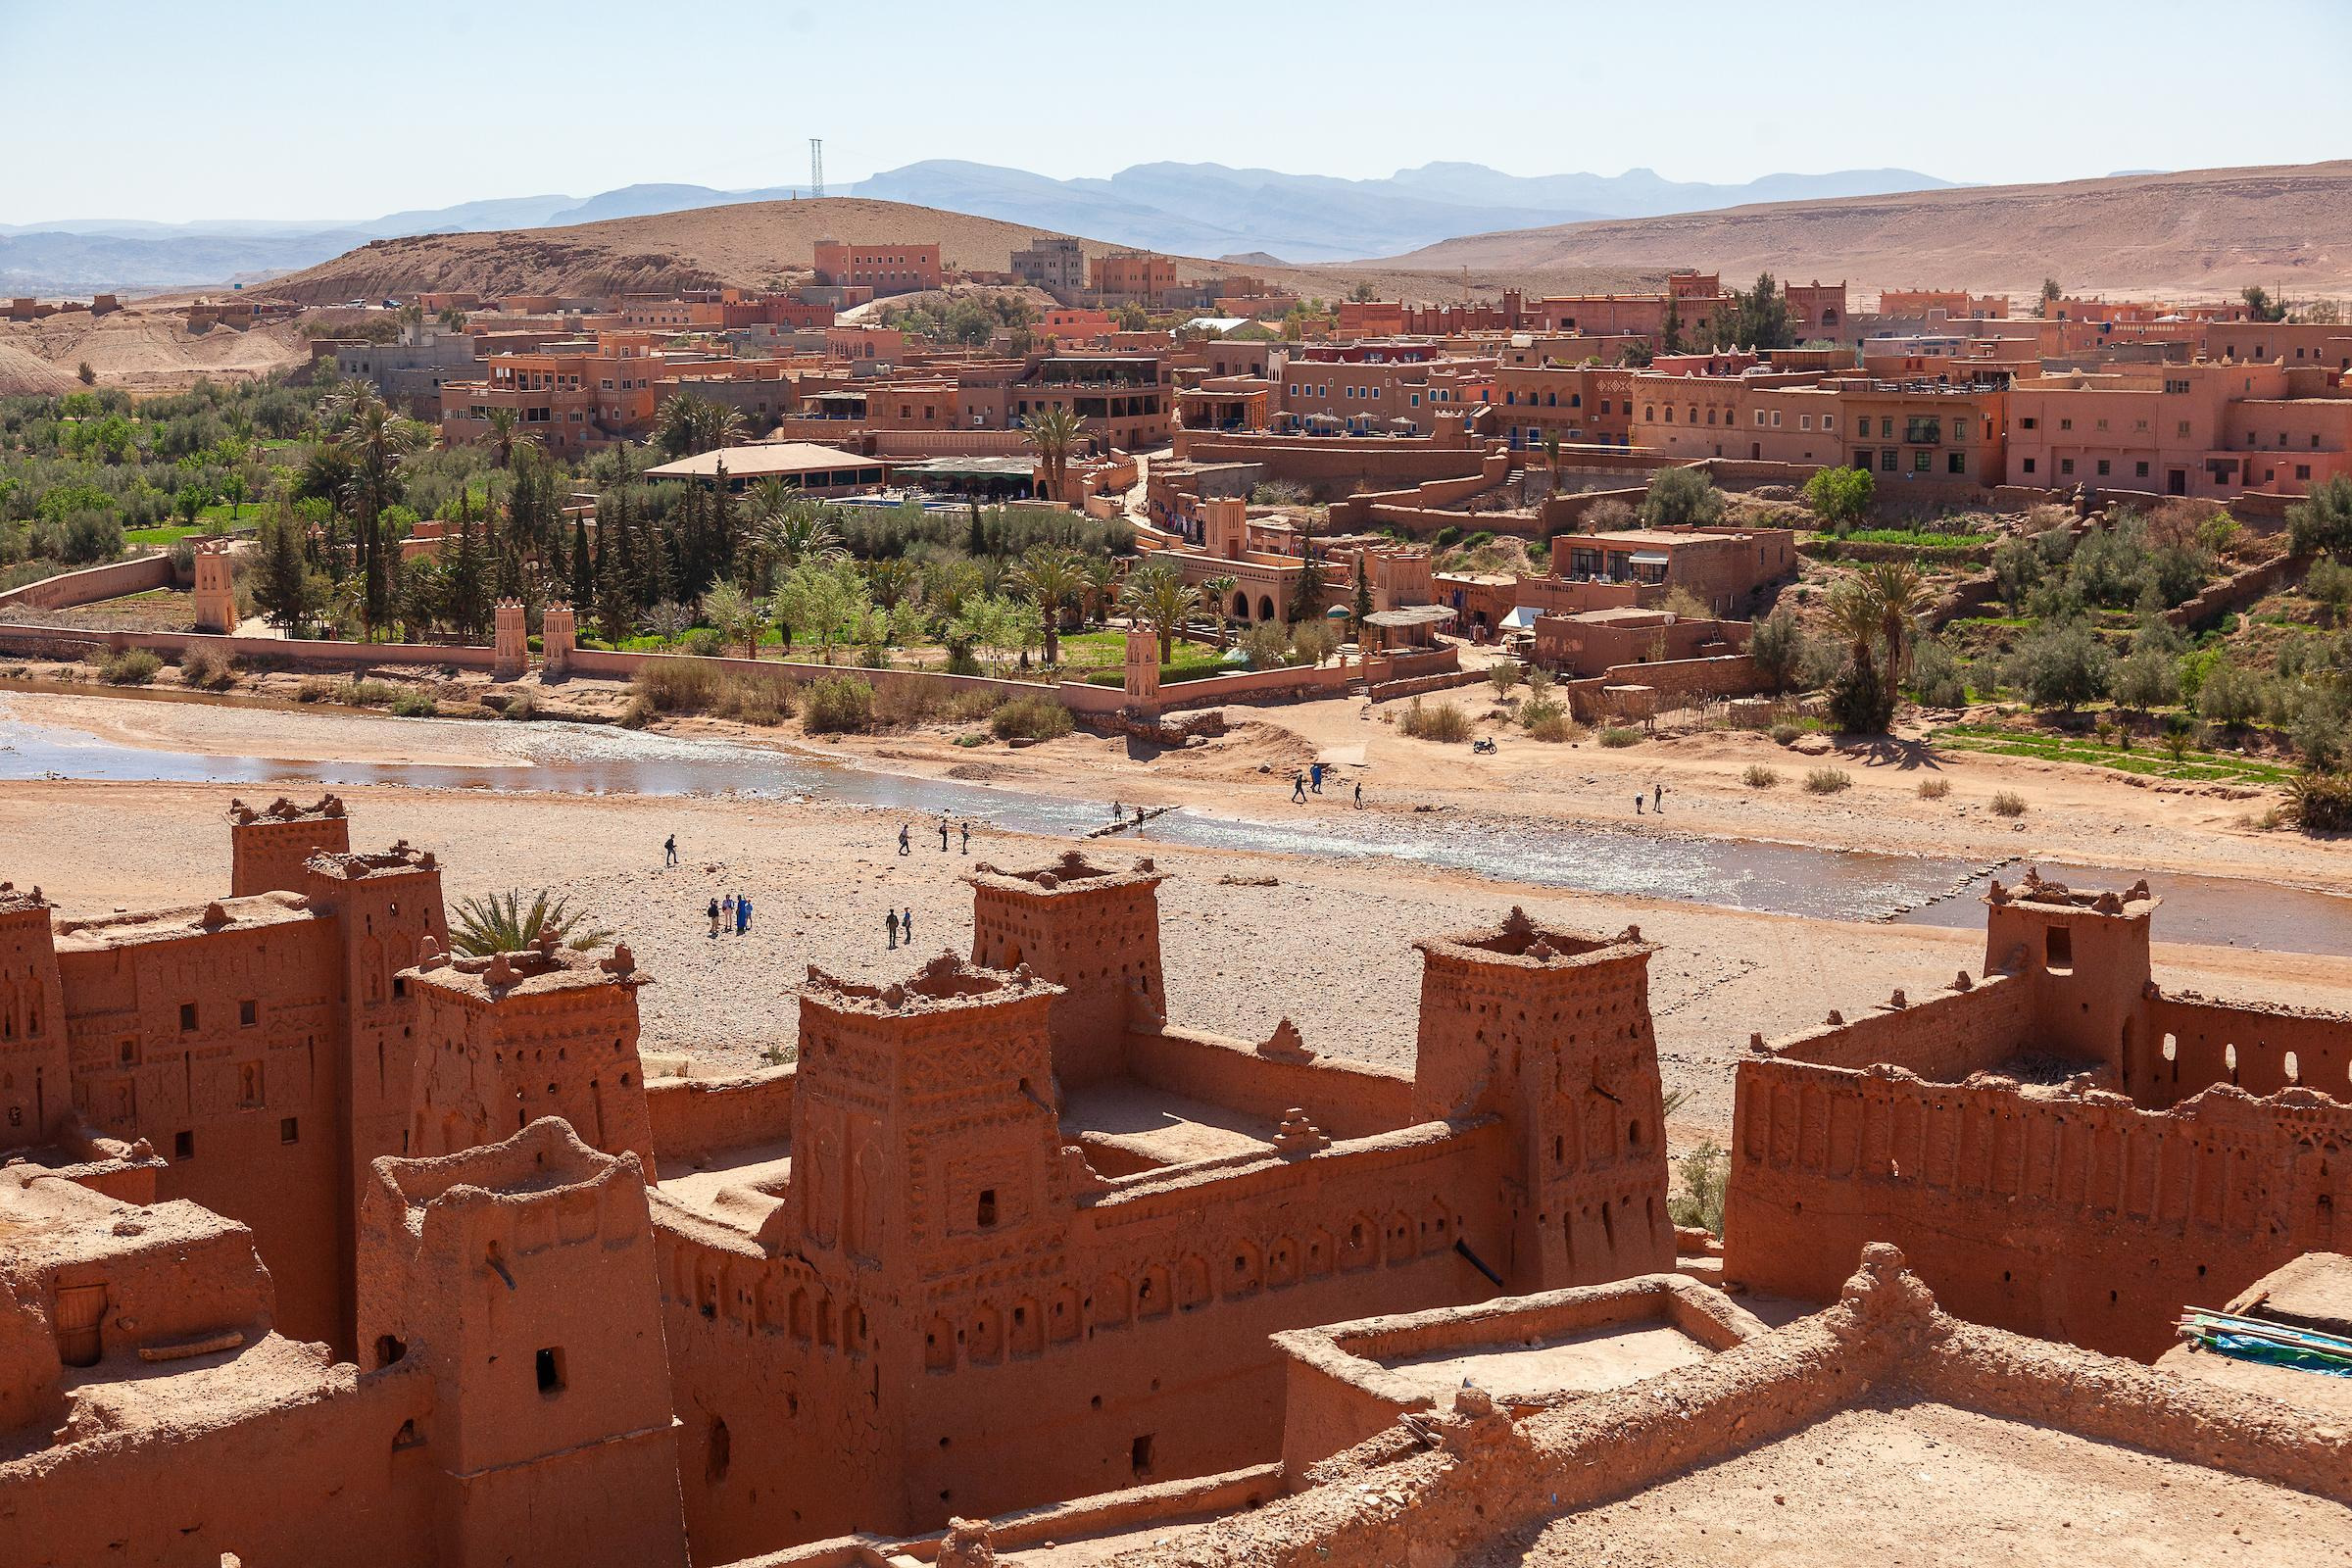 Game of Thrones Film Sites in Ouarzazate